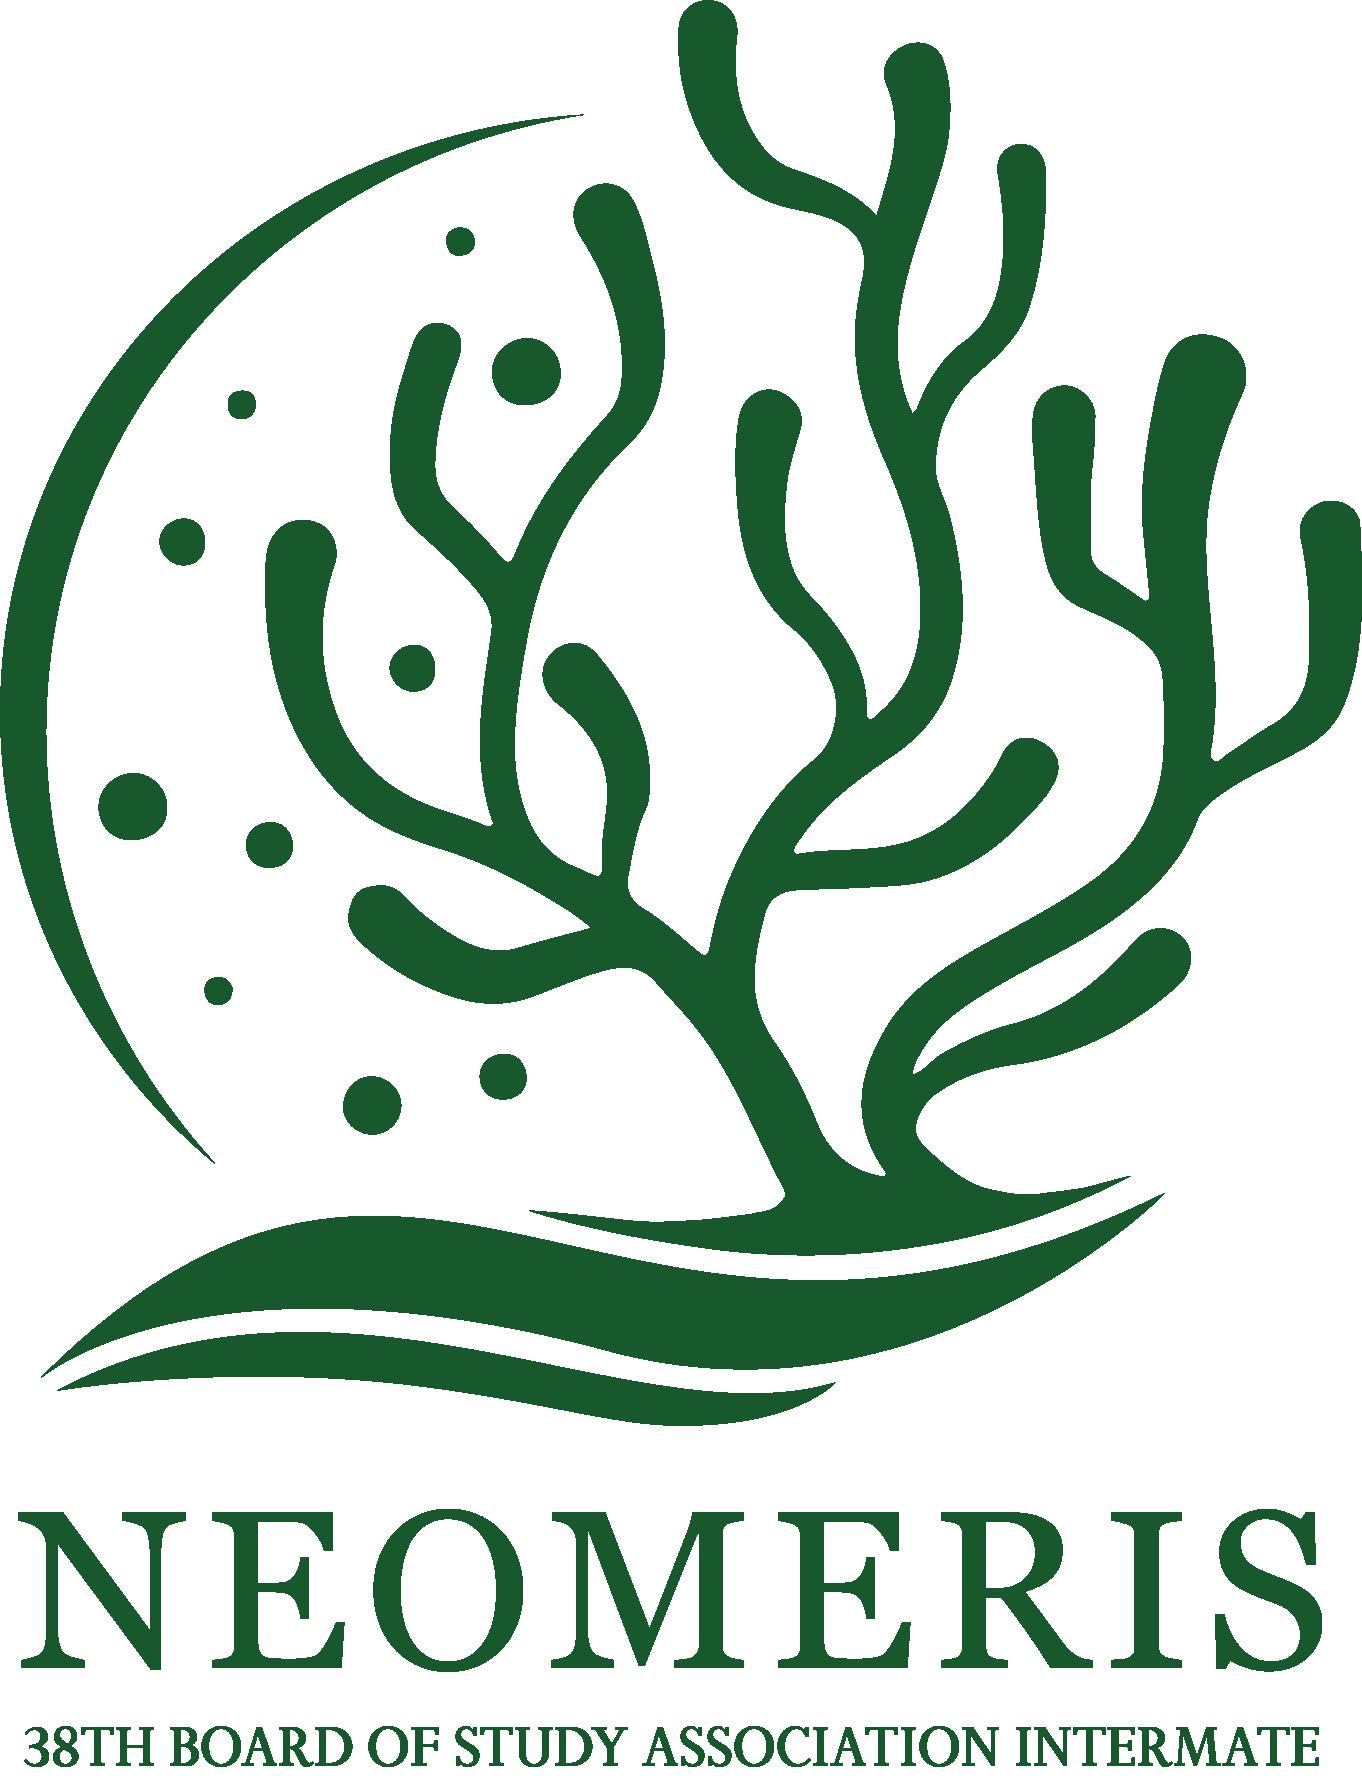 Logo_Neomeris_Full_Lockup_Colored(2).png